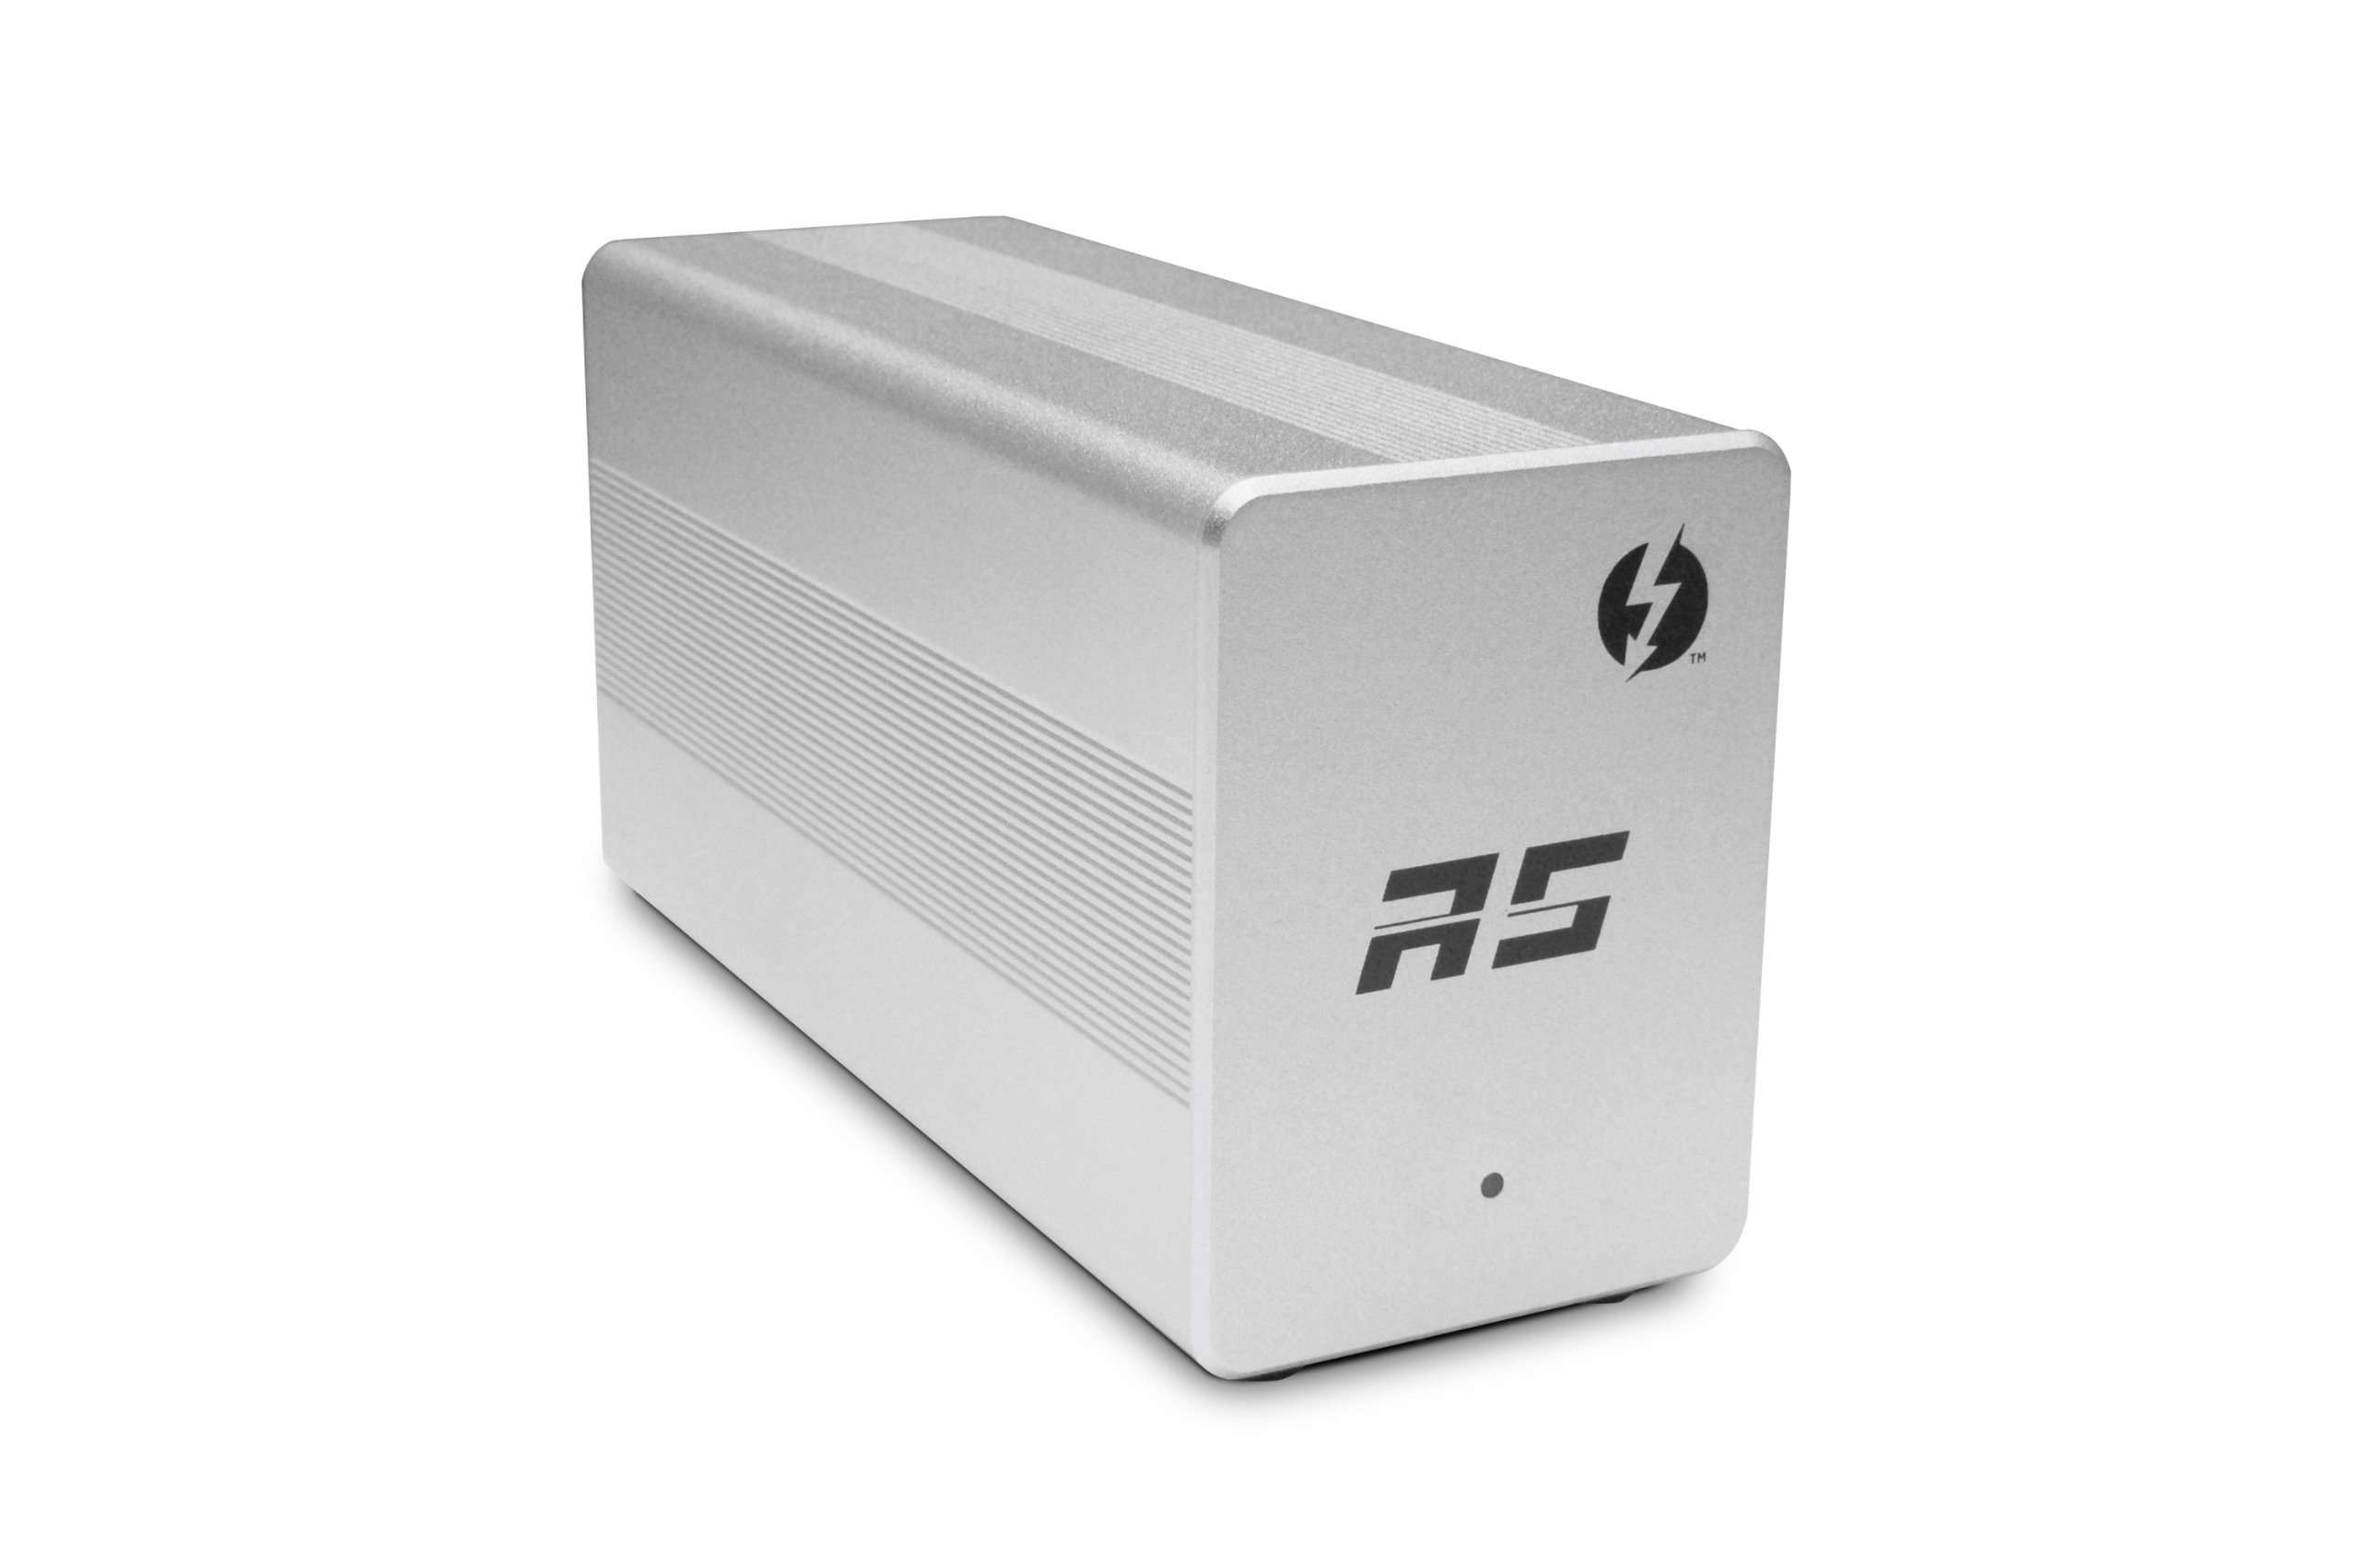 HighPoint RocketStor Thunderbolt 2 Storage Adapter 6324L